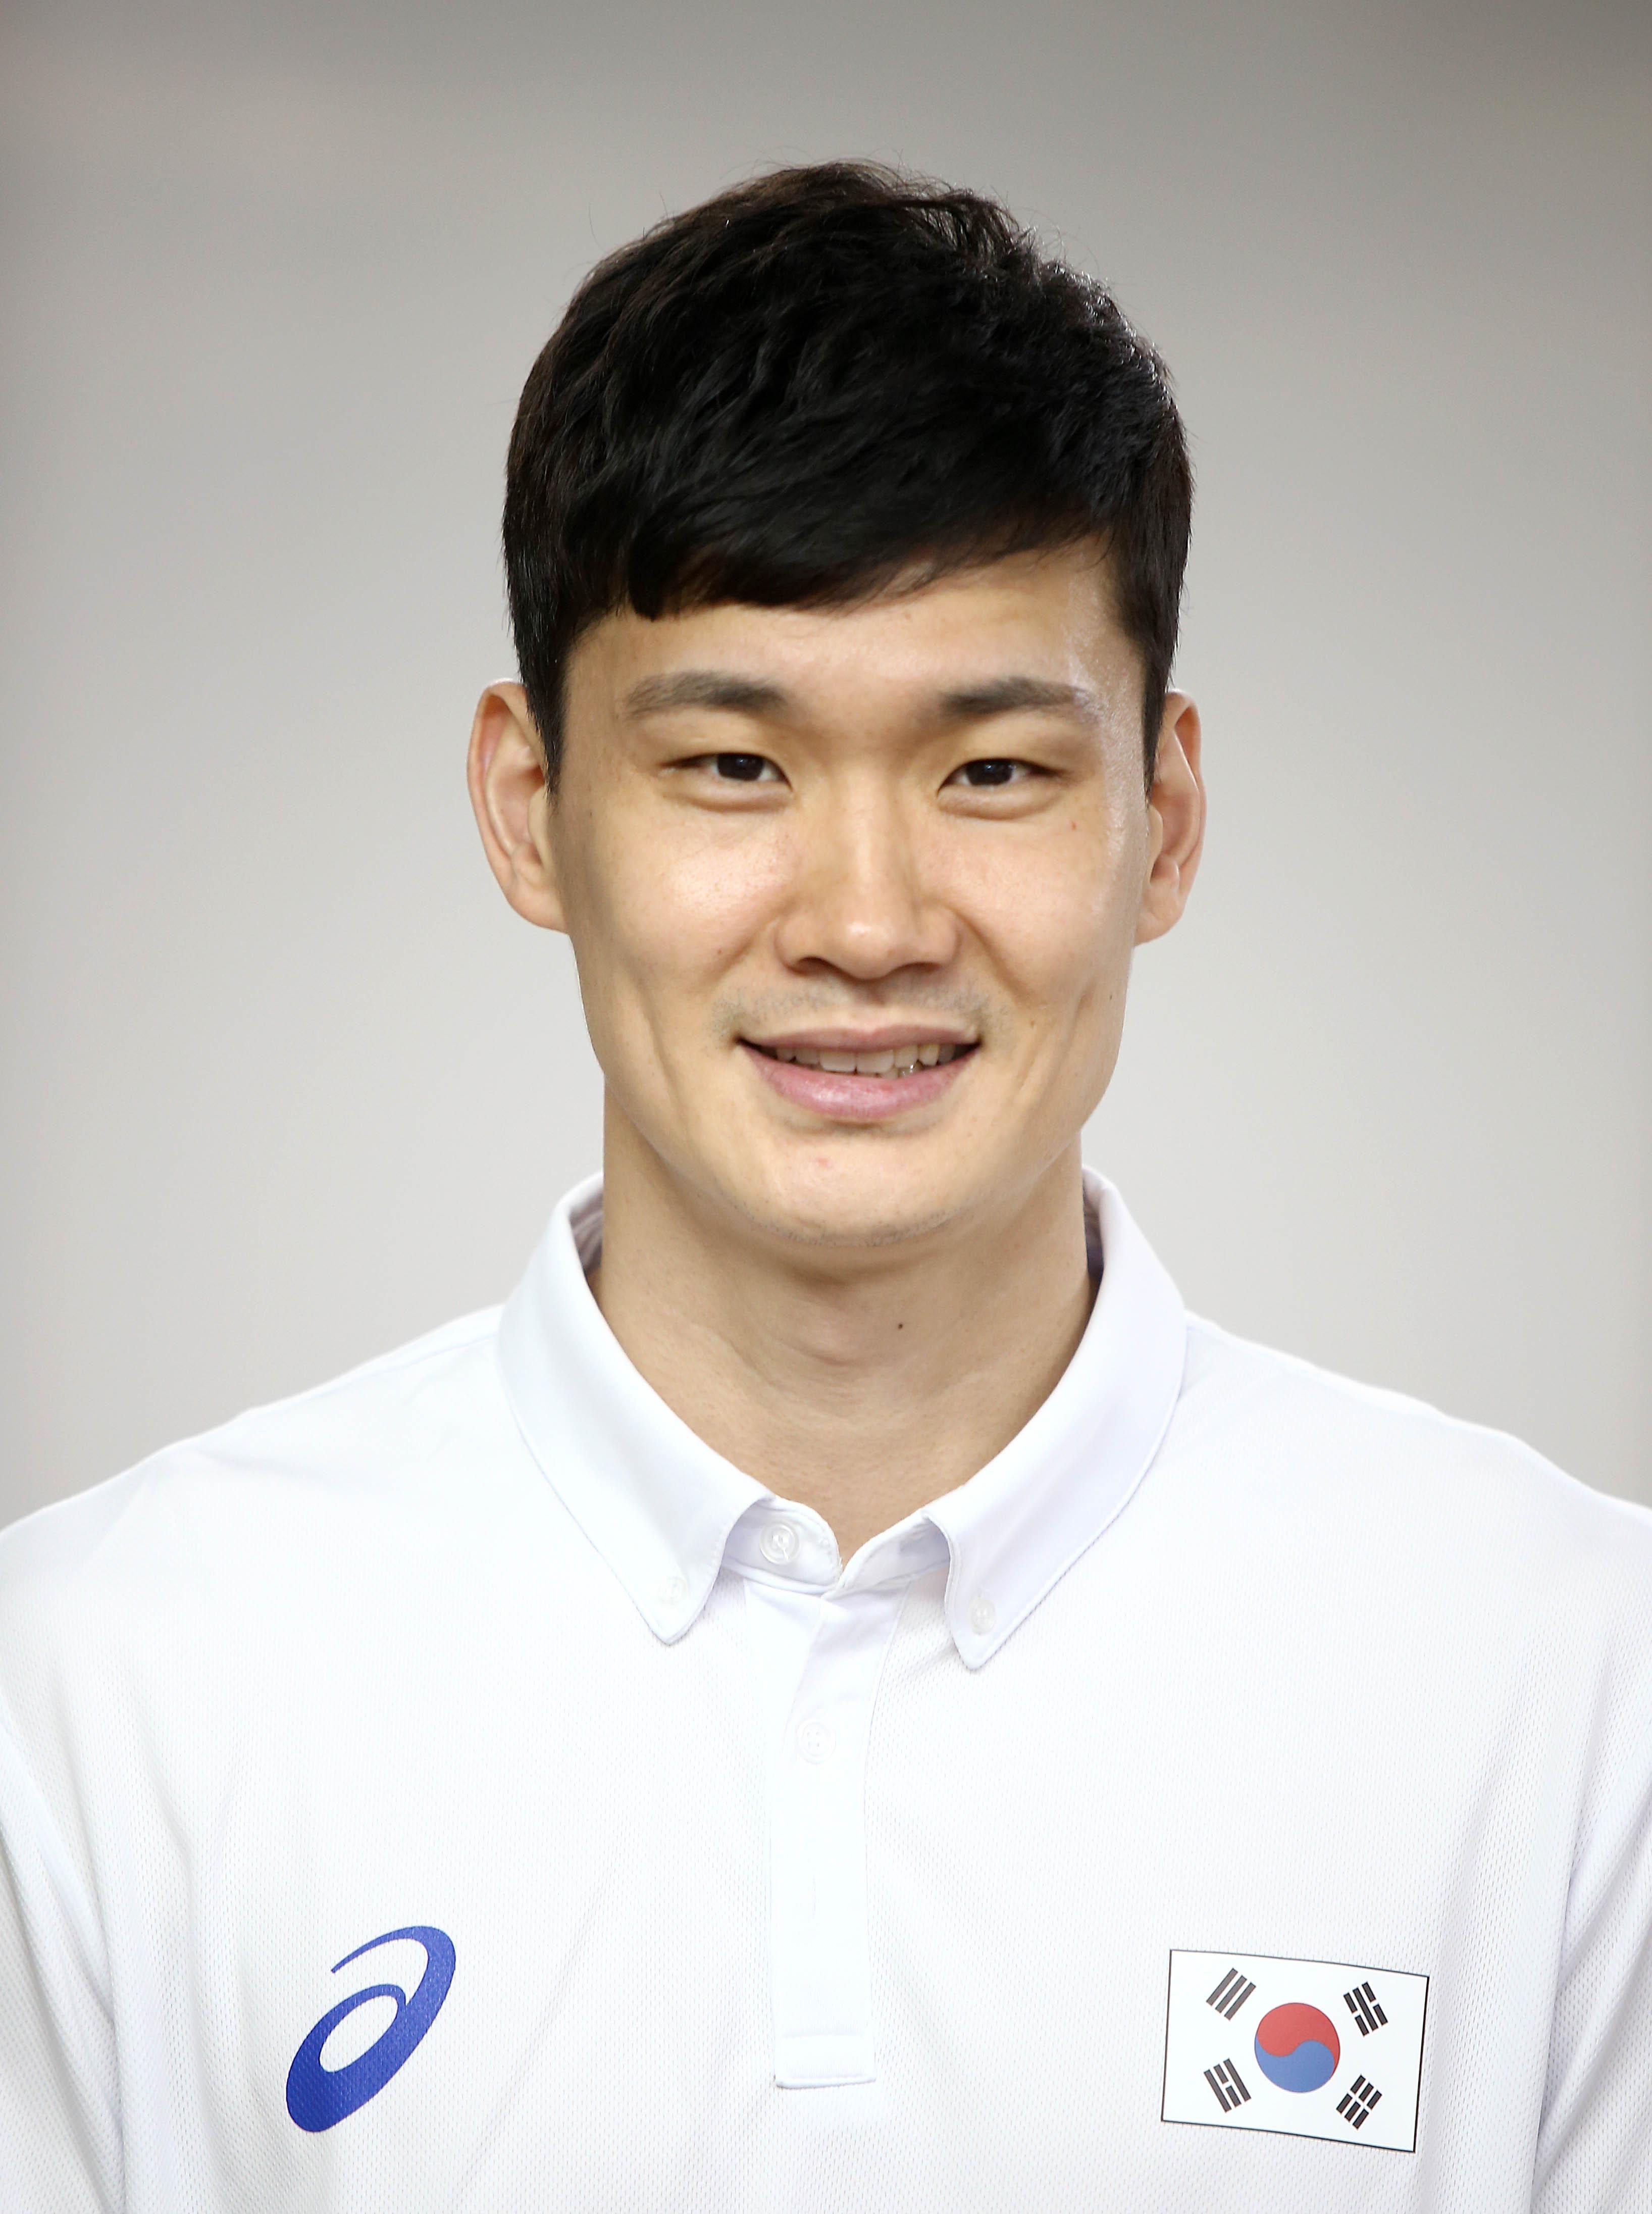 Sun-Kyu Lee